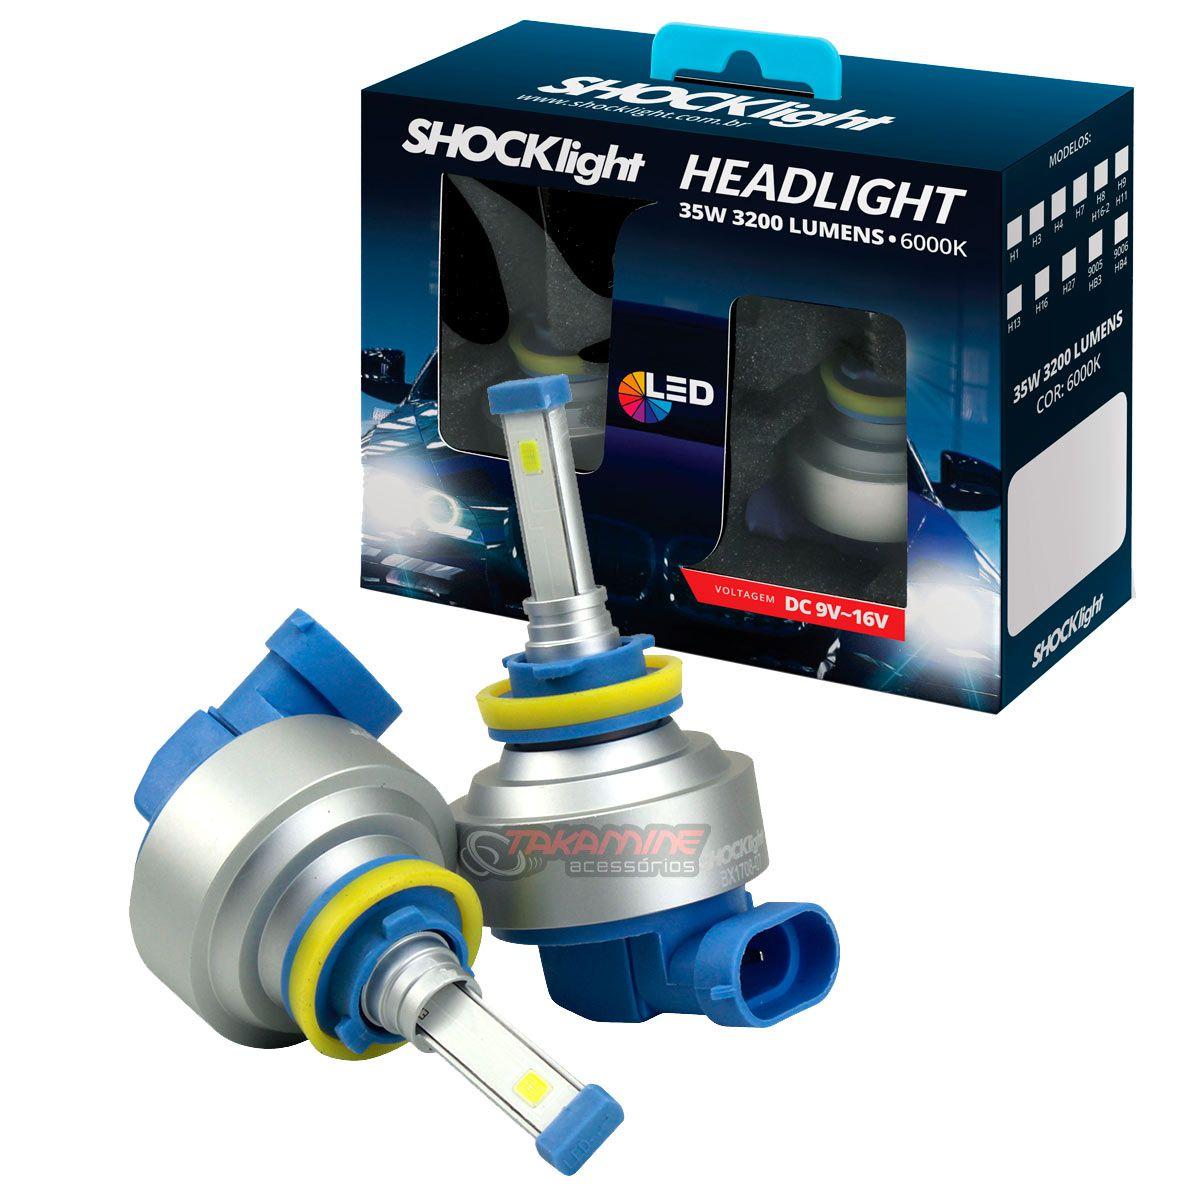 Kit LED tipo xenon modelo H11 35W encaixe original plug & play New Headlight